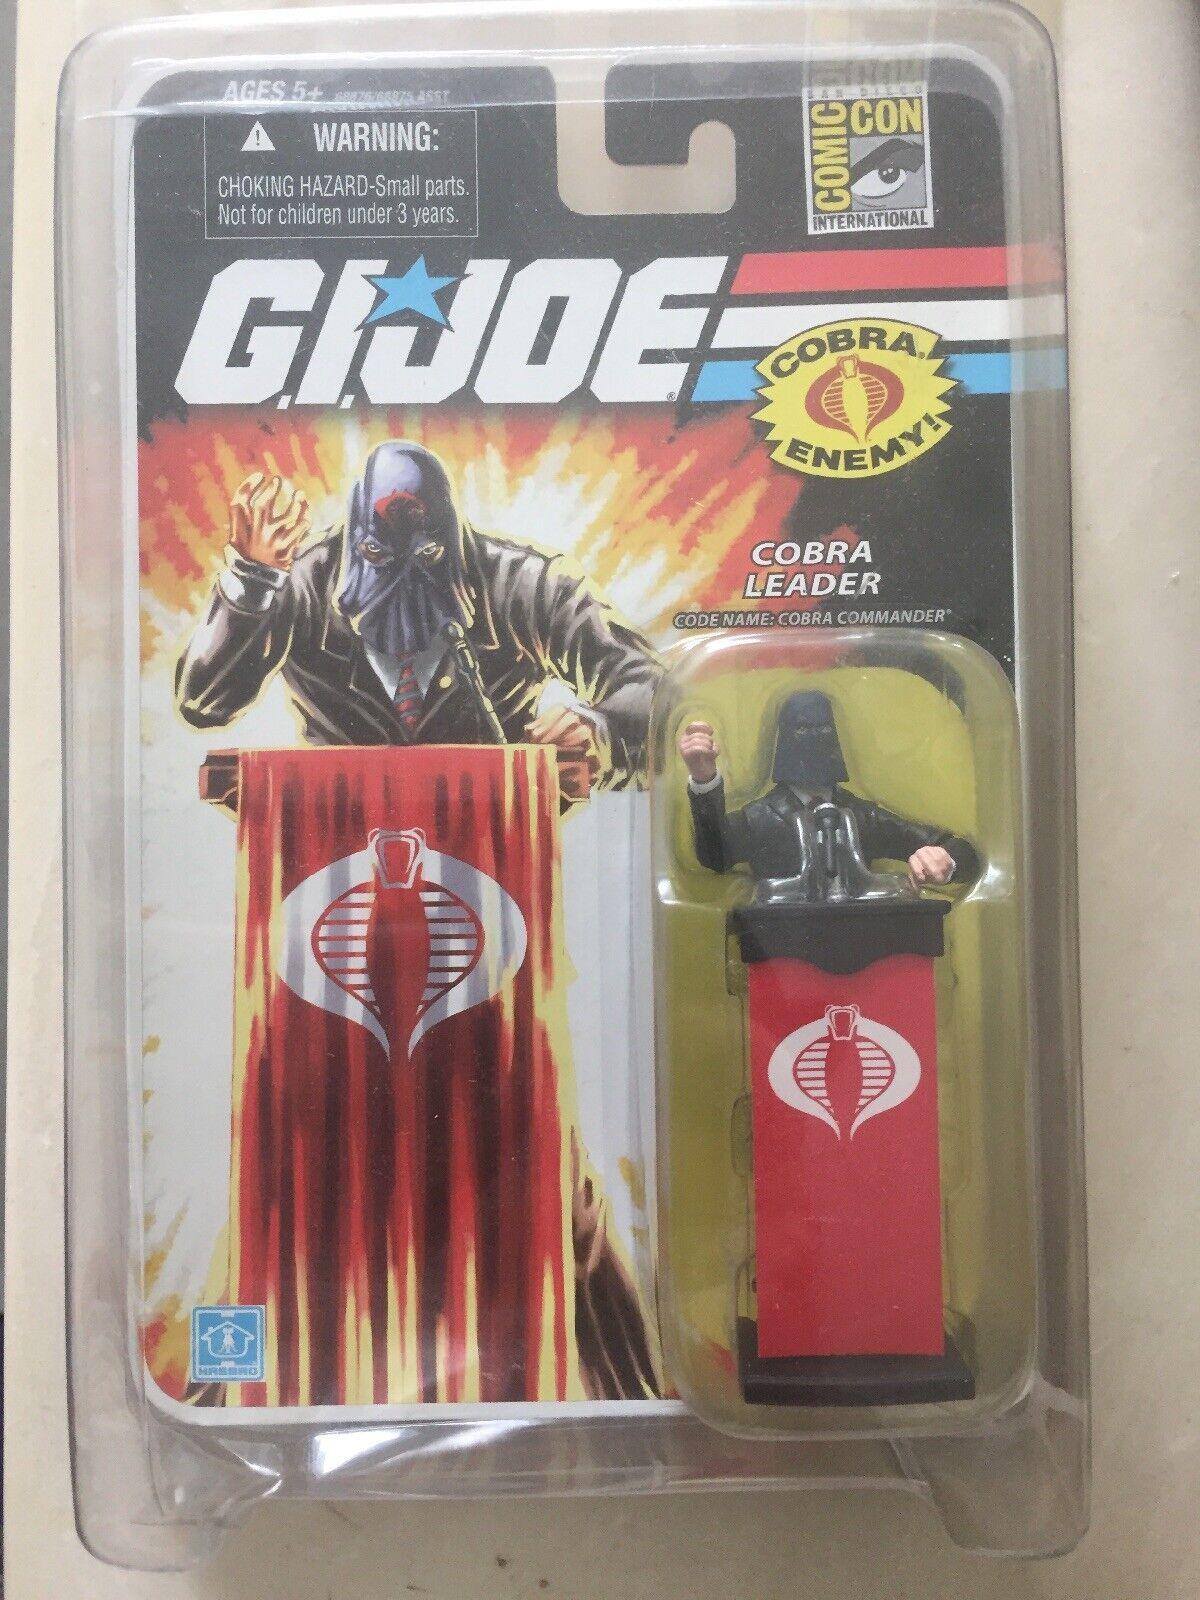 New Cobra Commander Leader G.I. Joe 25th Anniversary 2008 SDCC Convention Excl